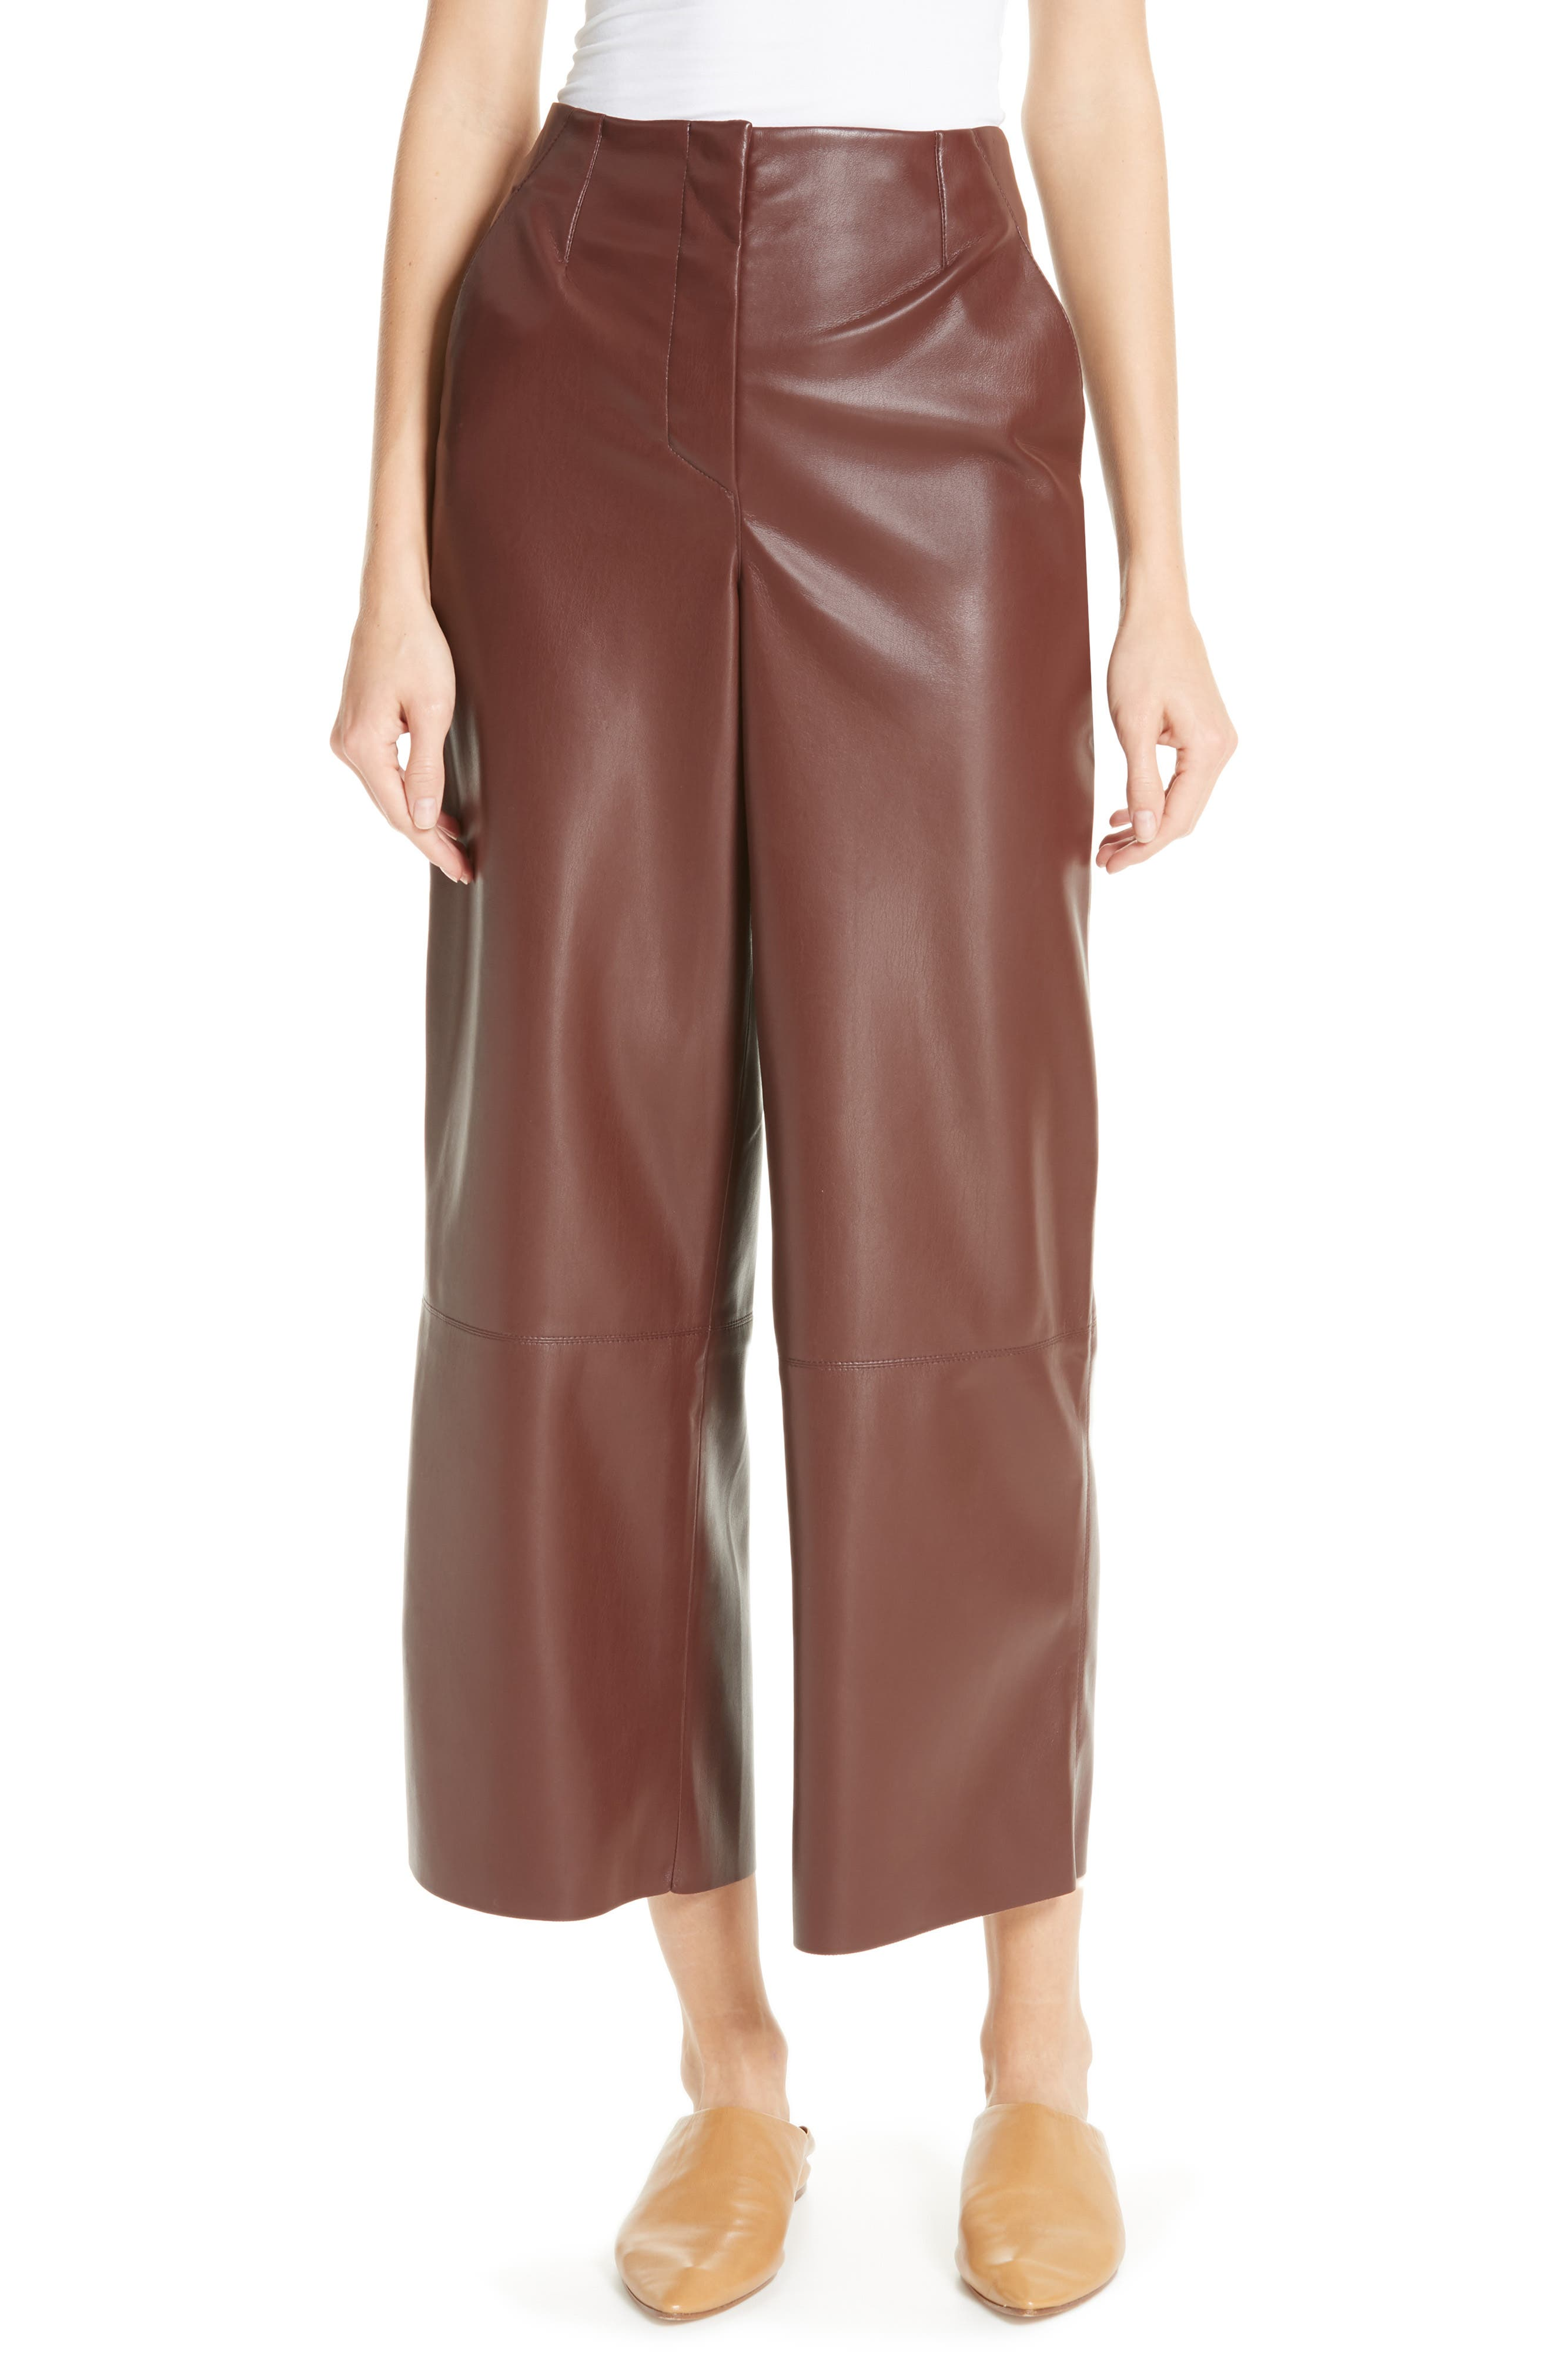 Africa Faux Leather Wide Leg Crop Pants,                         Main,                         color, PLUM CHUTNEY